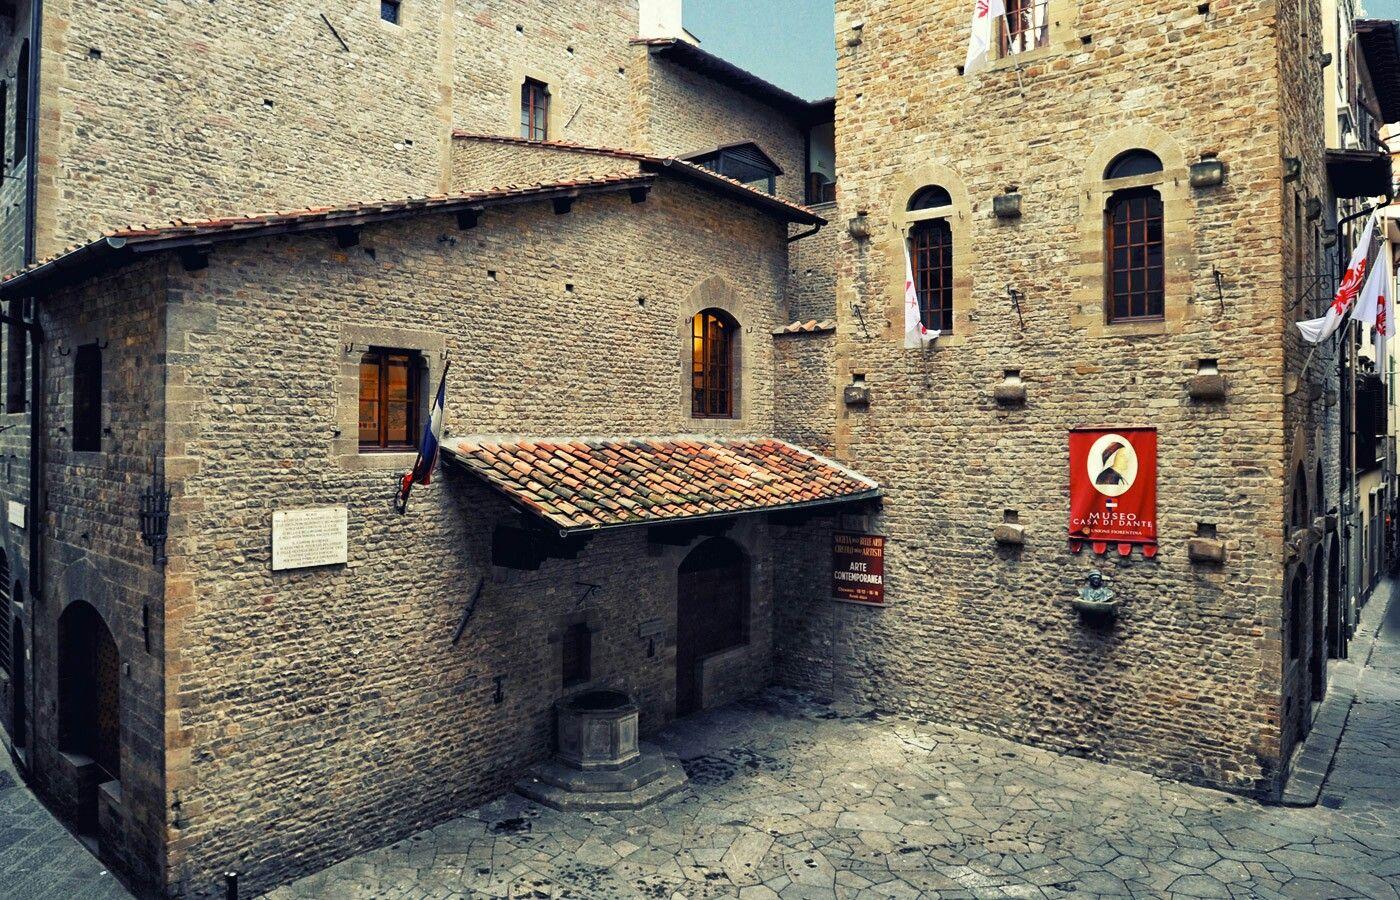 Firenze Casa Di Dante Alighieri Sec Xiii Florence Florence Italy Historical Place